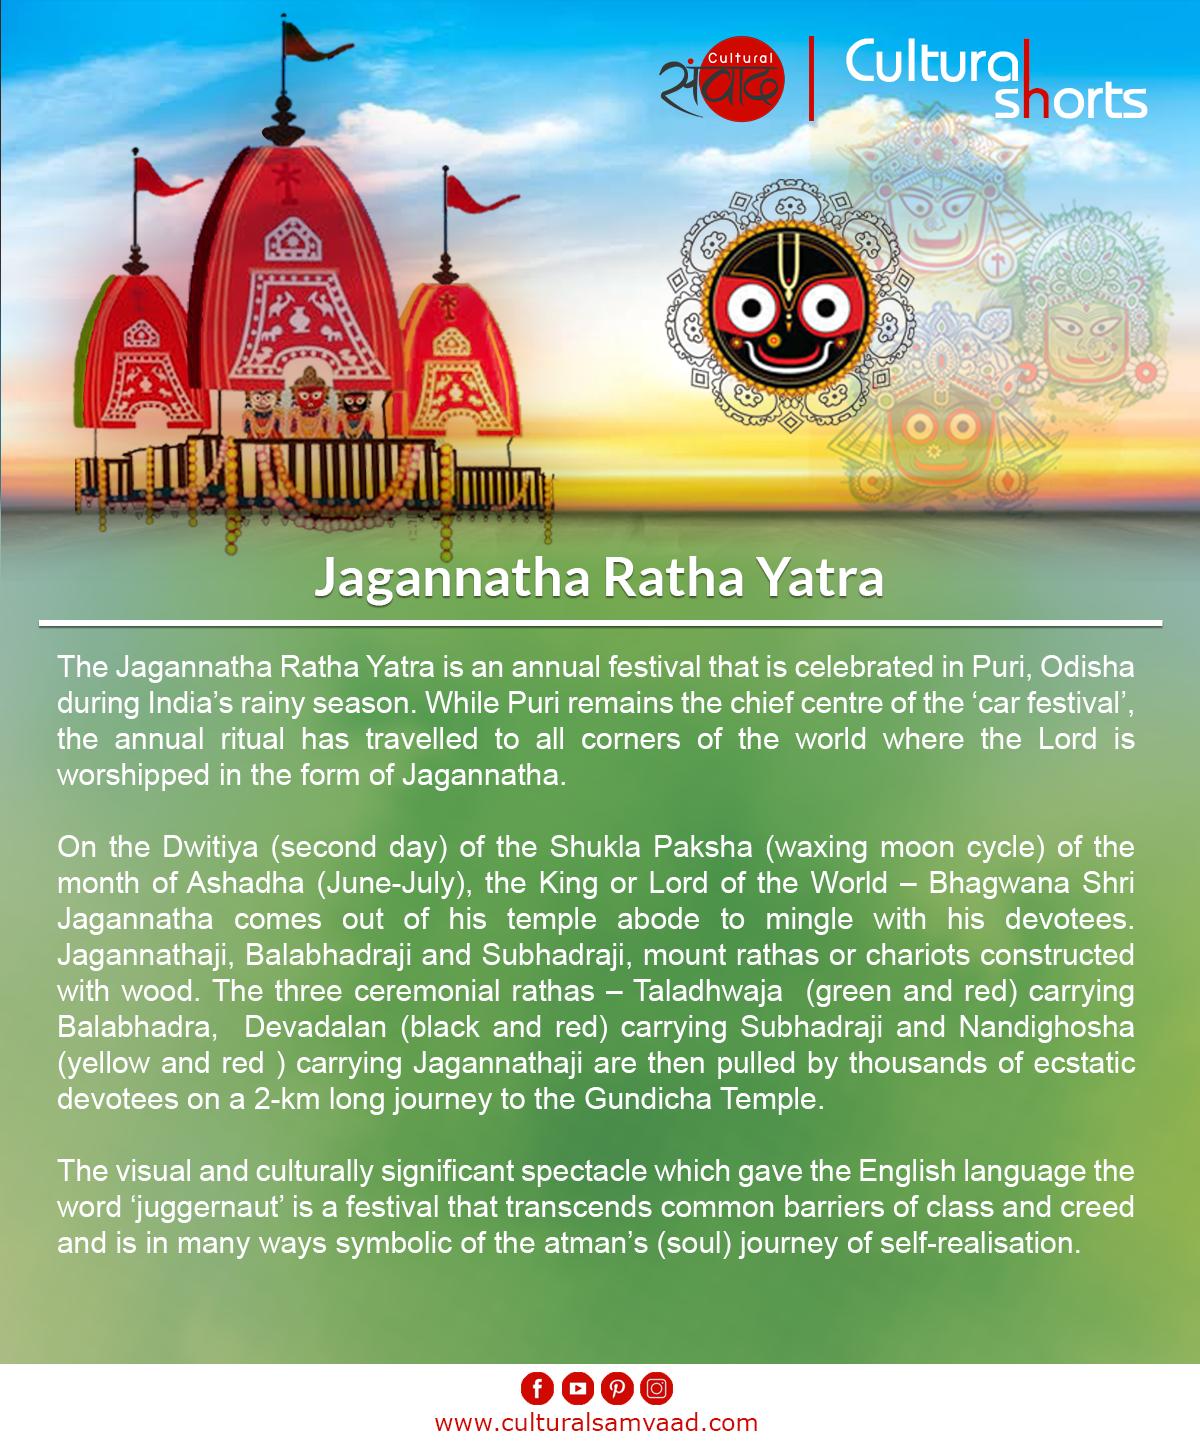 Jagannatha Ratha Yatra Jagannatha Rath Yatra Festivals Of India [ 1442 x 1200 Pixel ]